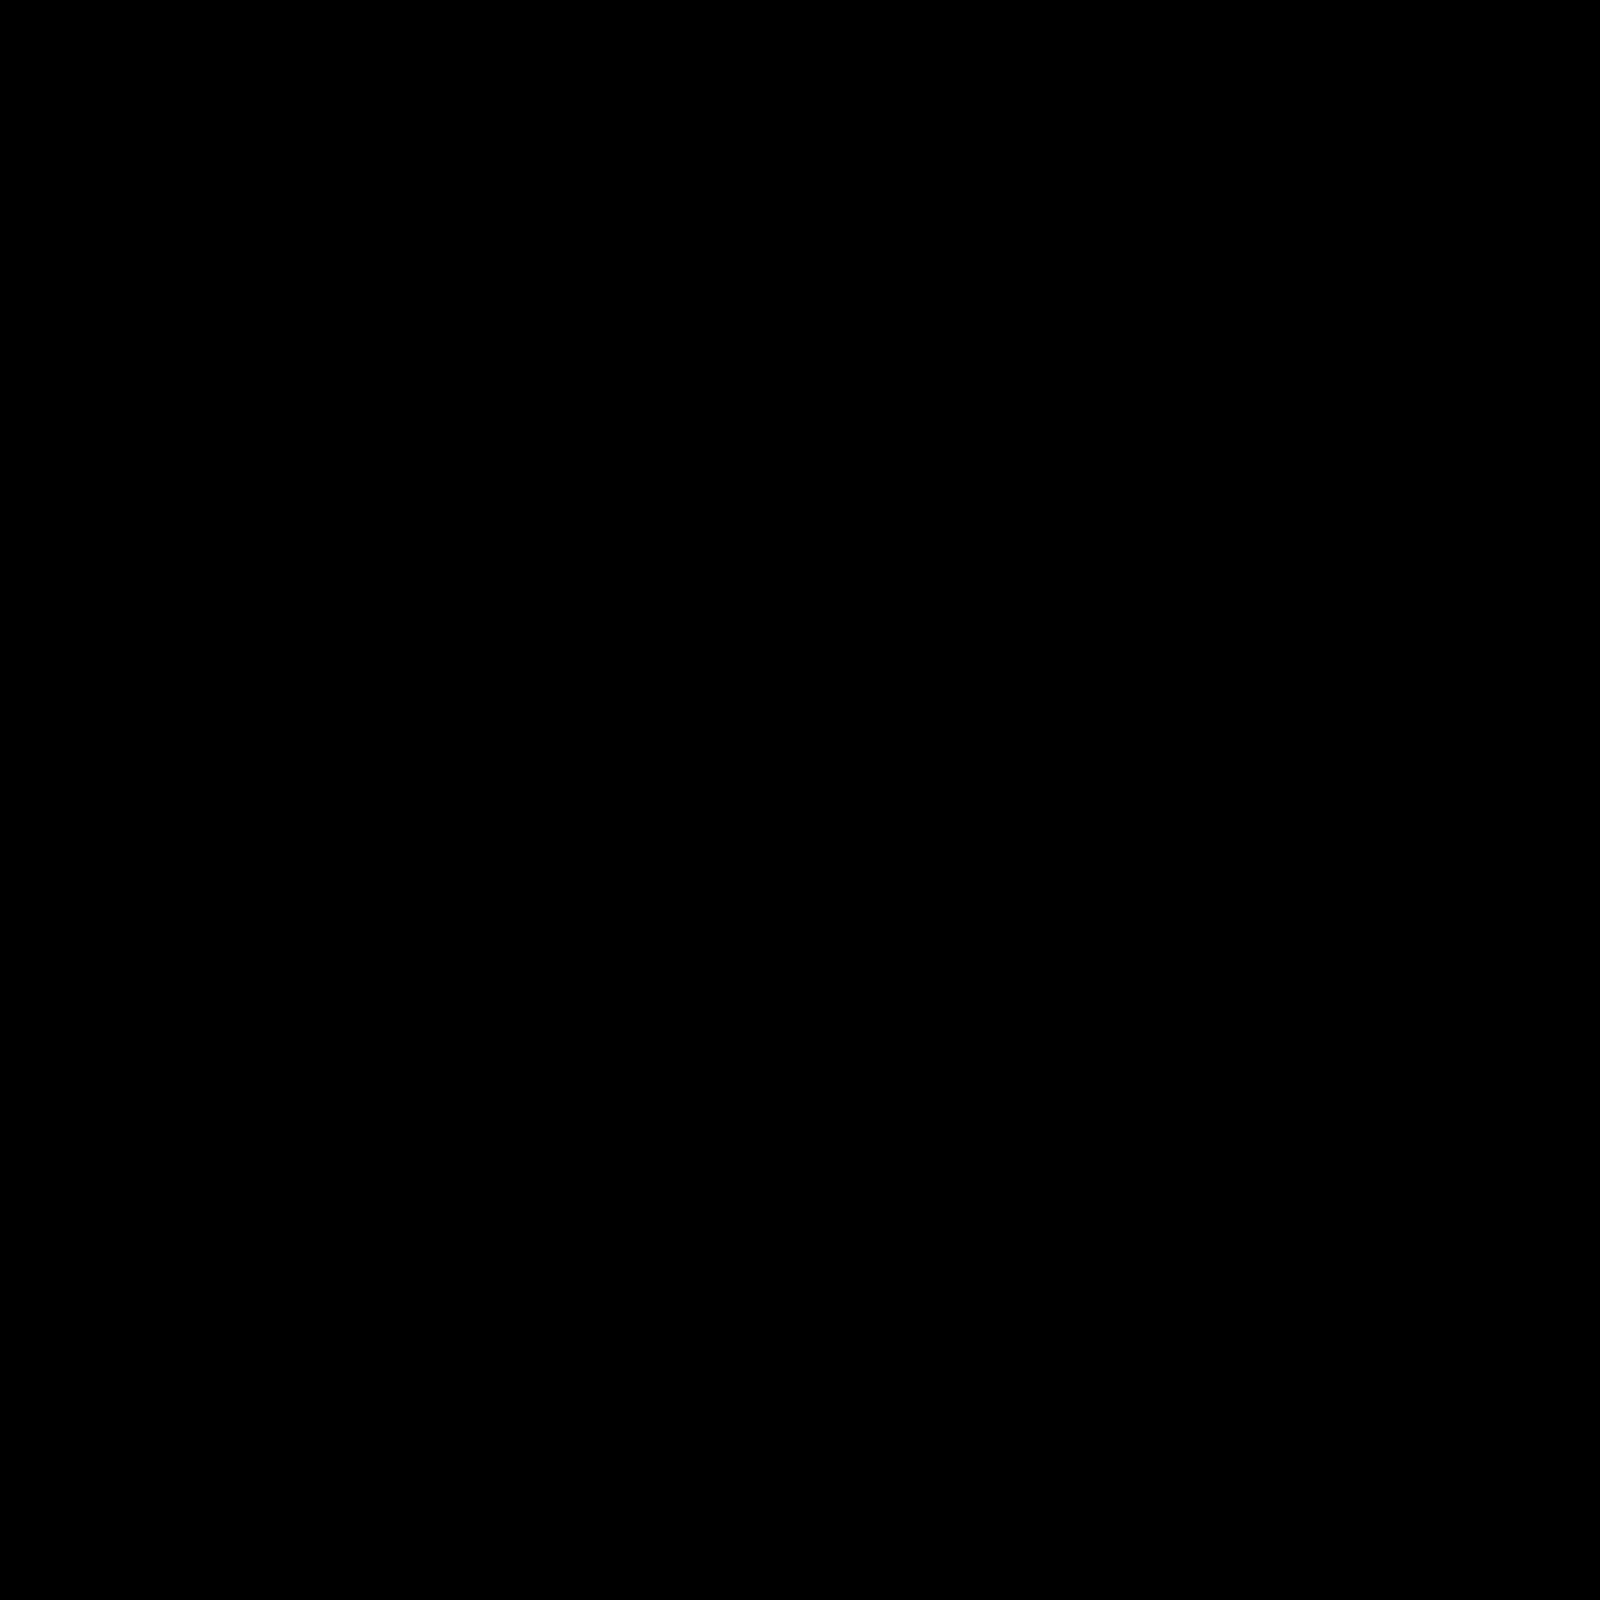 Bike Path icon